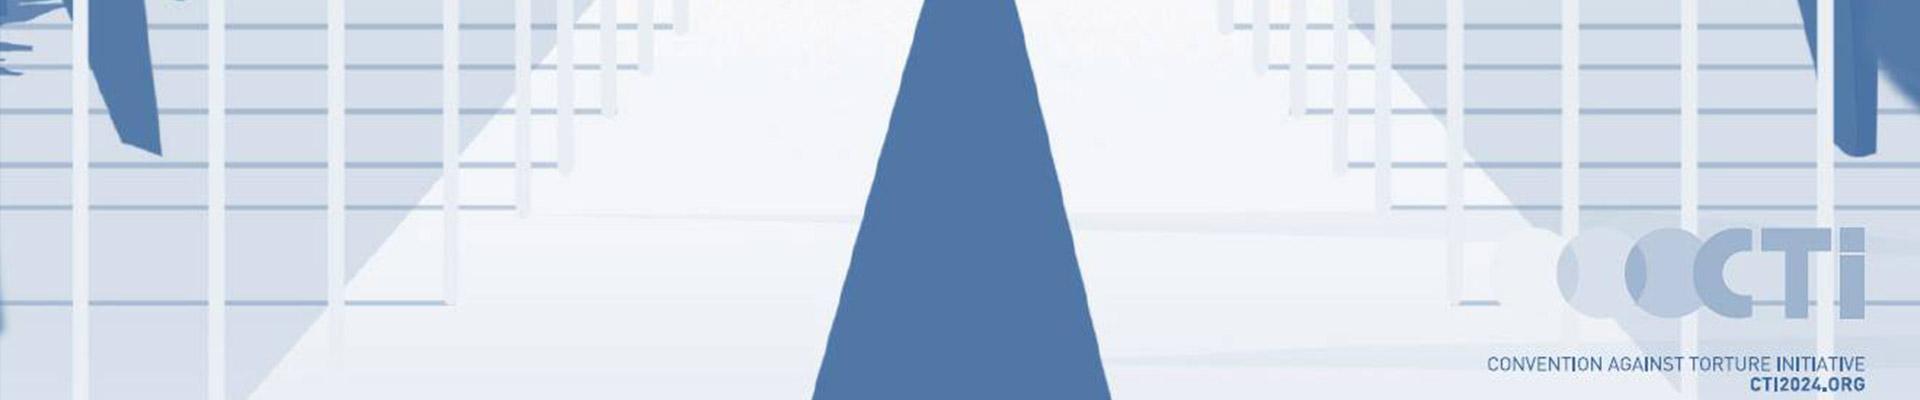 CTI Banner Image